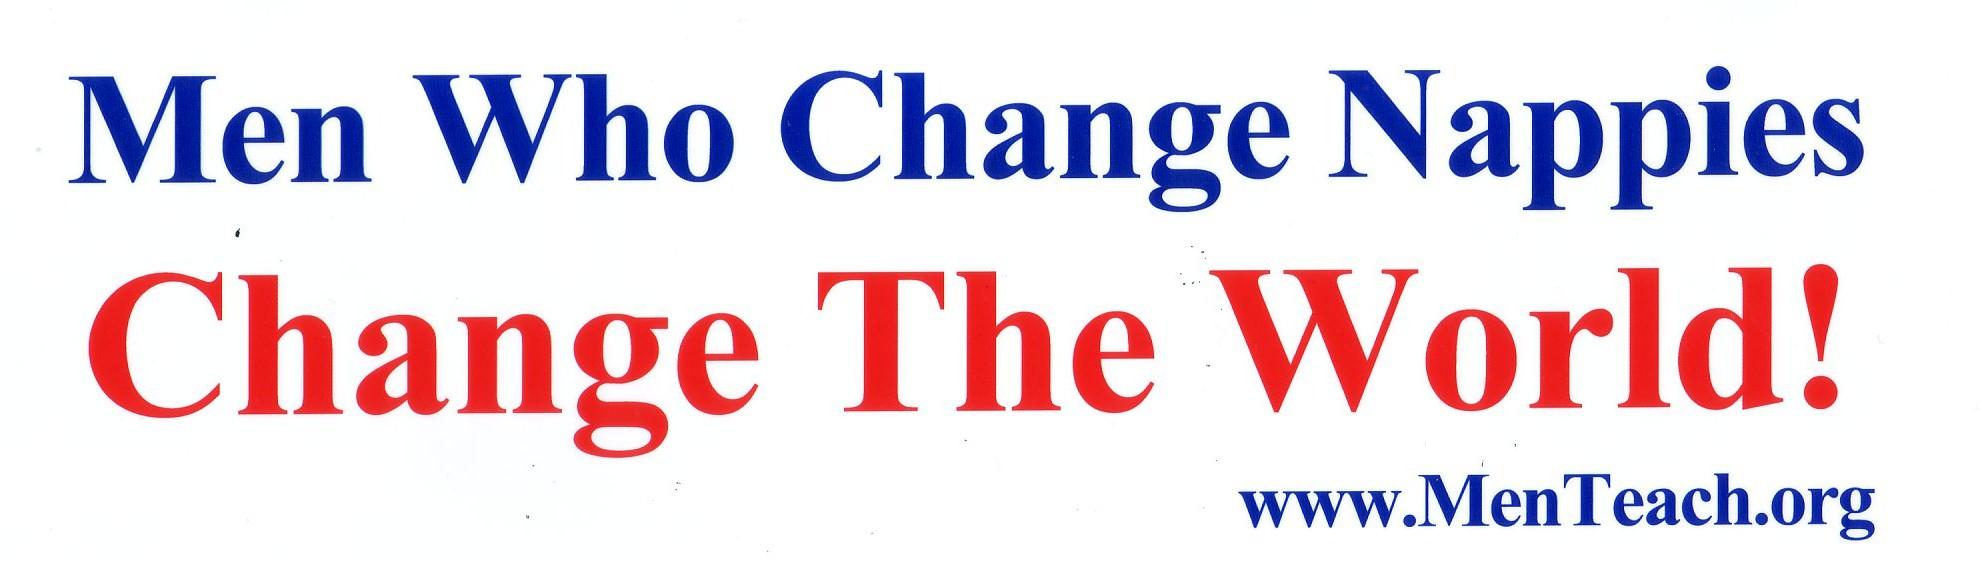 men_change_nappies